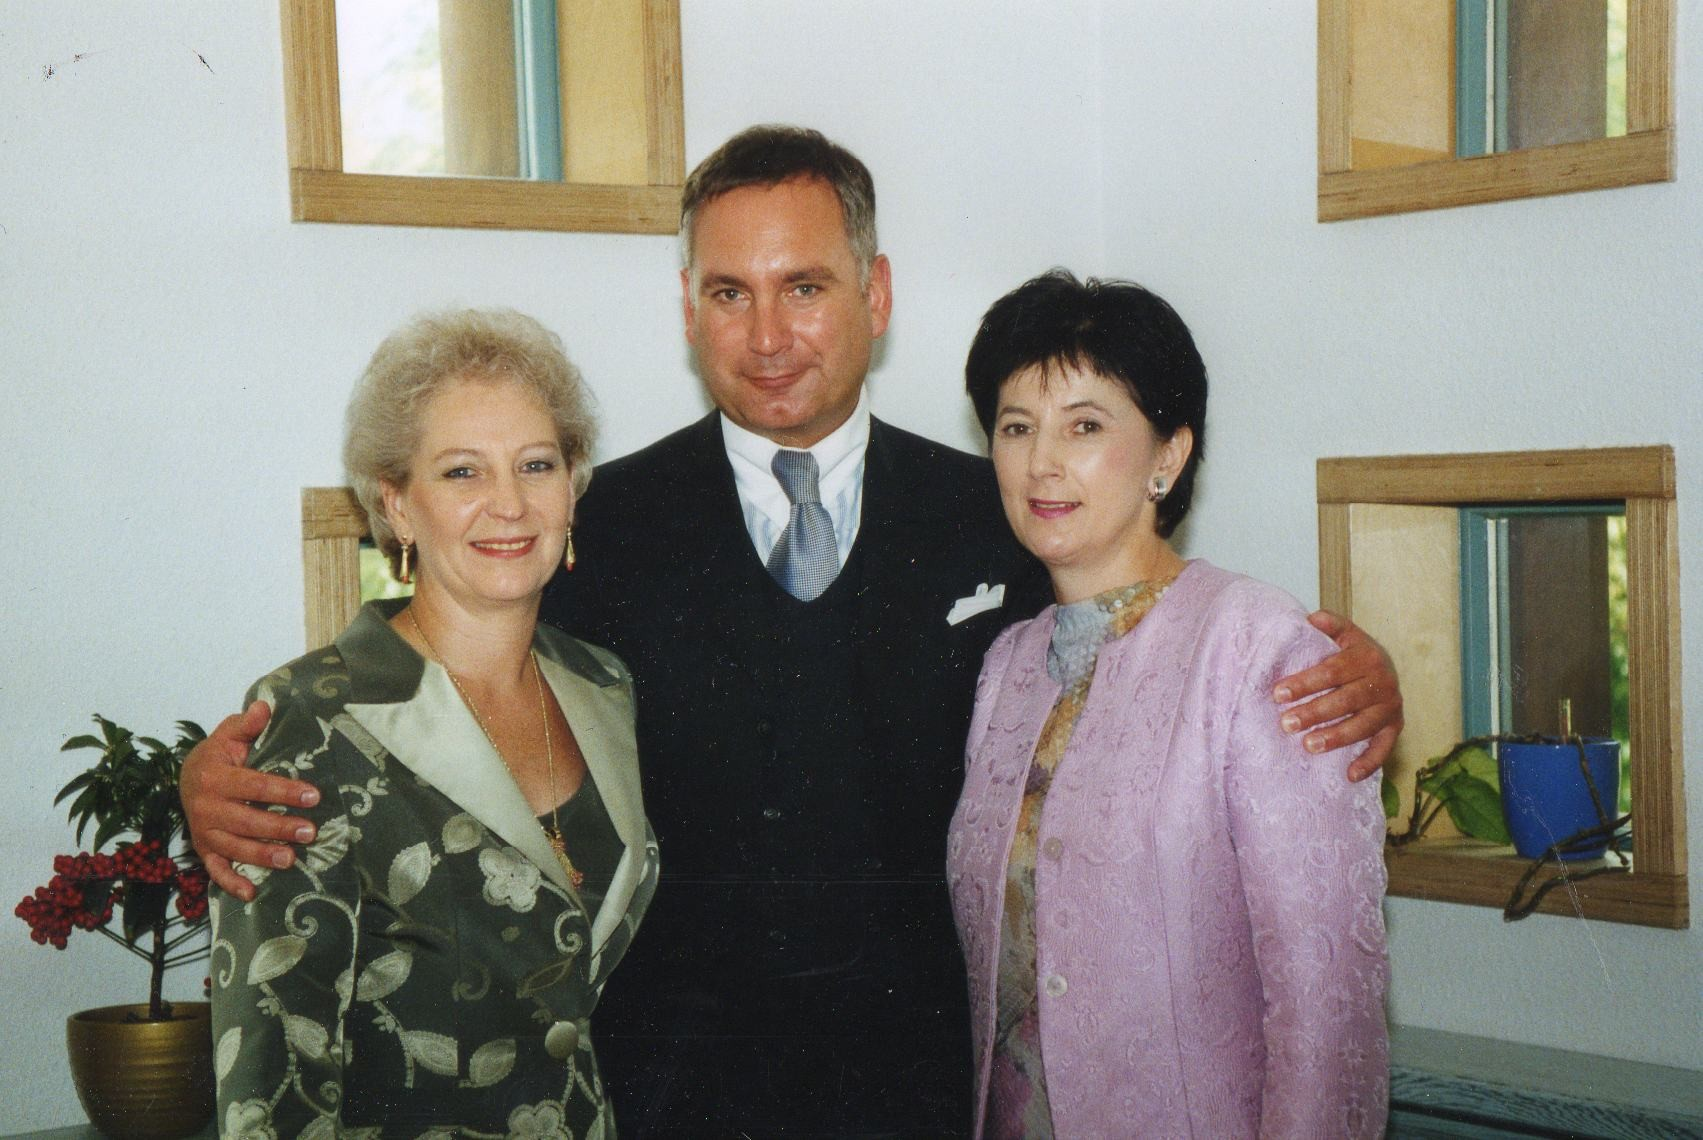 v.l.n.r. Helga Freier, Herr Pape aus Paris, Frau Priller aus Wien - 2001 Nürnberg